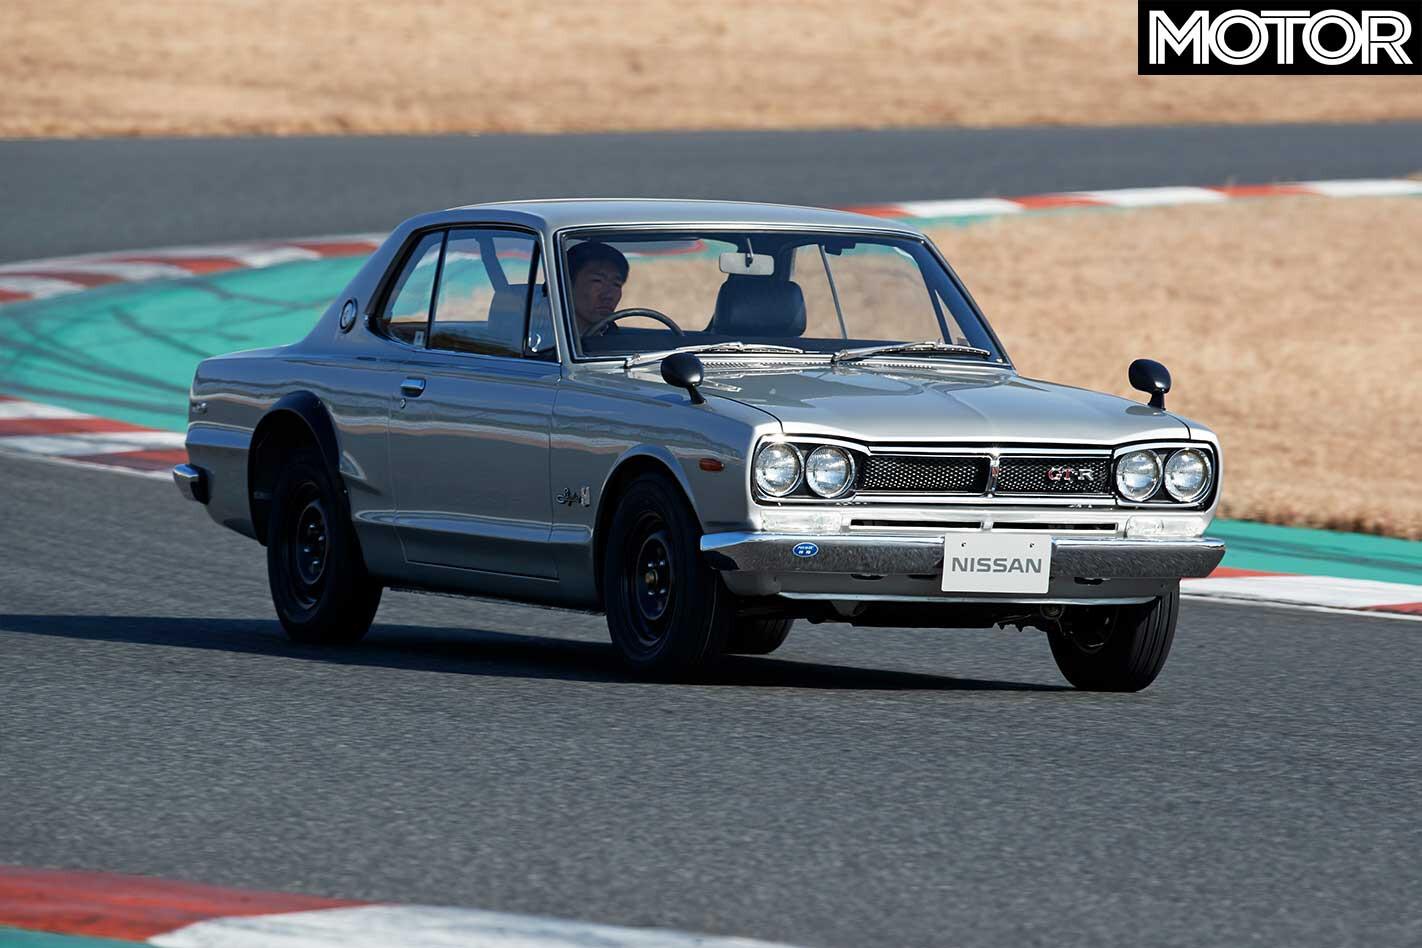 1972 Nissan KPGC 10 GT R Dynamic Jpg